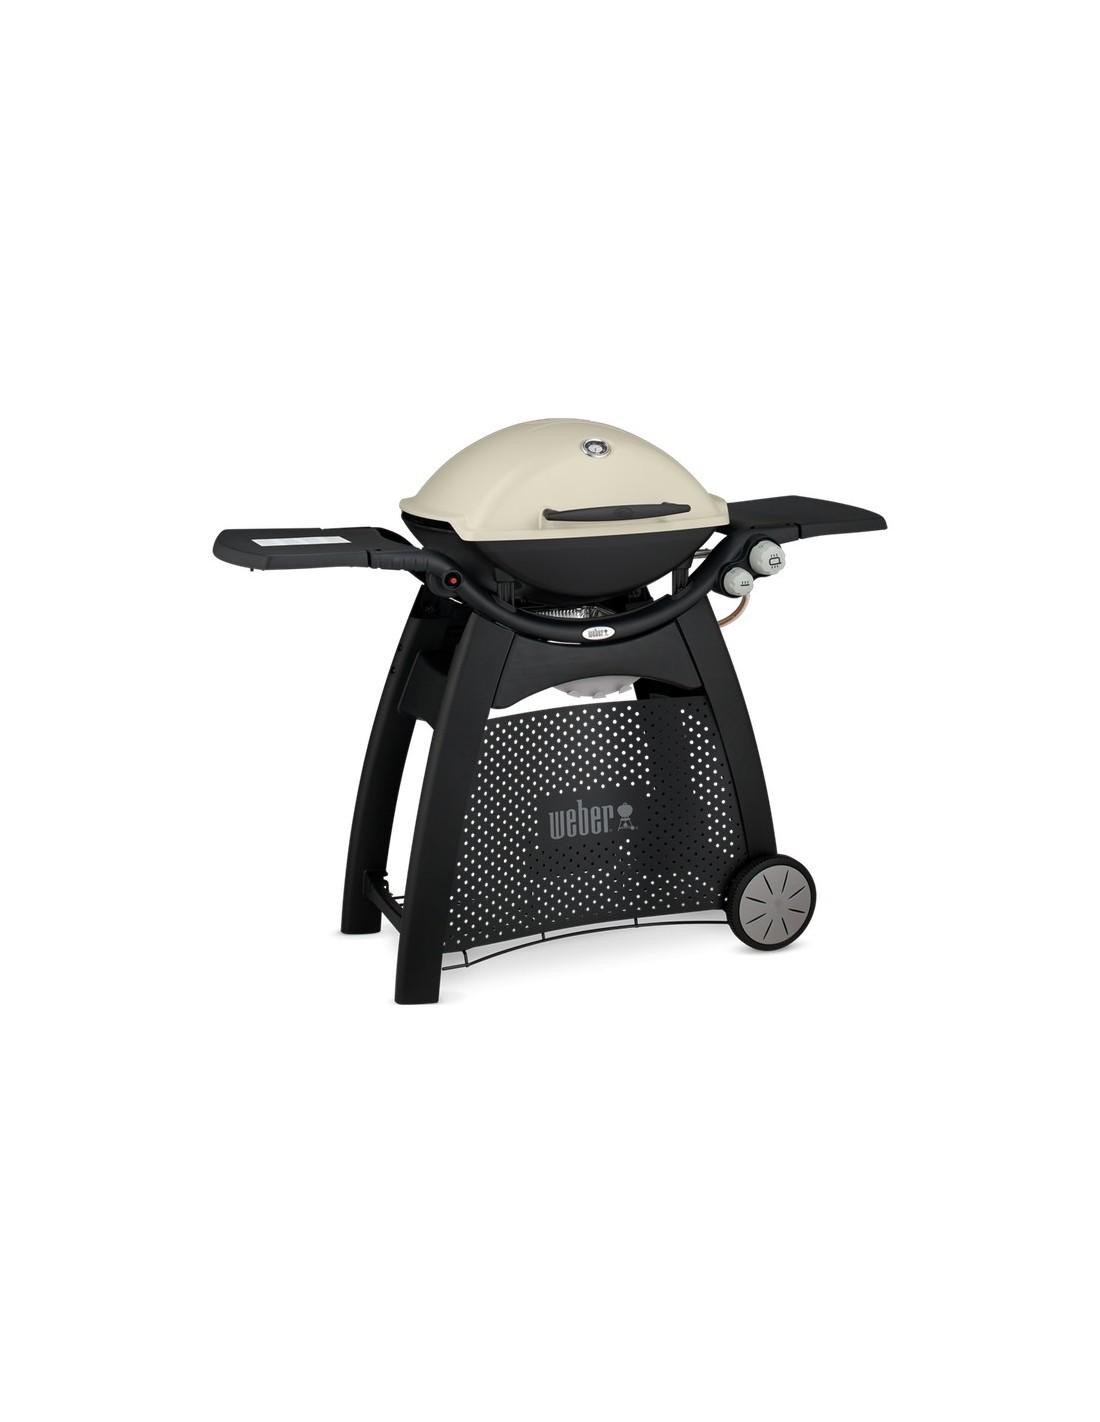 barbecue gaz q3000 titanium avec chariot et plancha weber. Black Bedroom Furniture Sets. Home Design Ideas